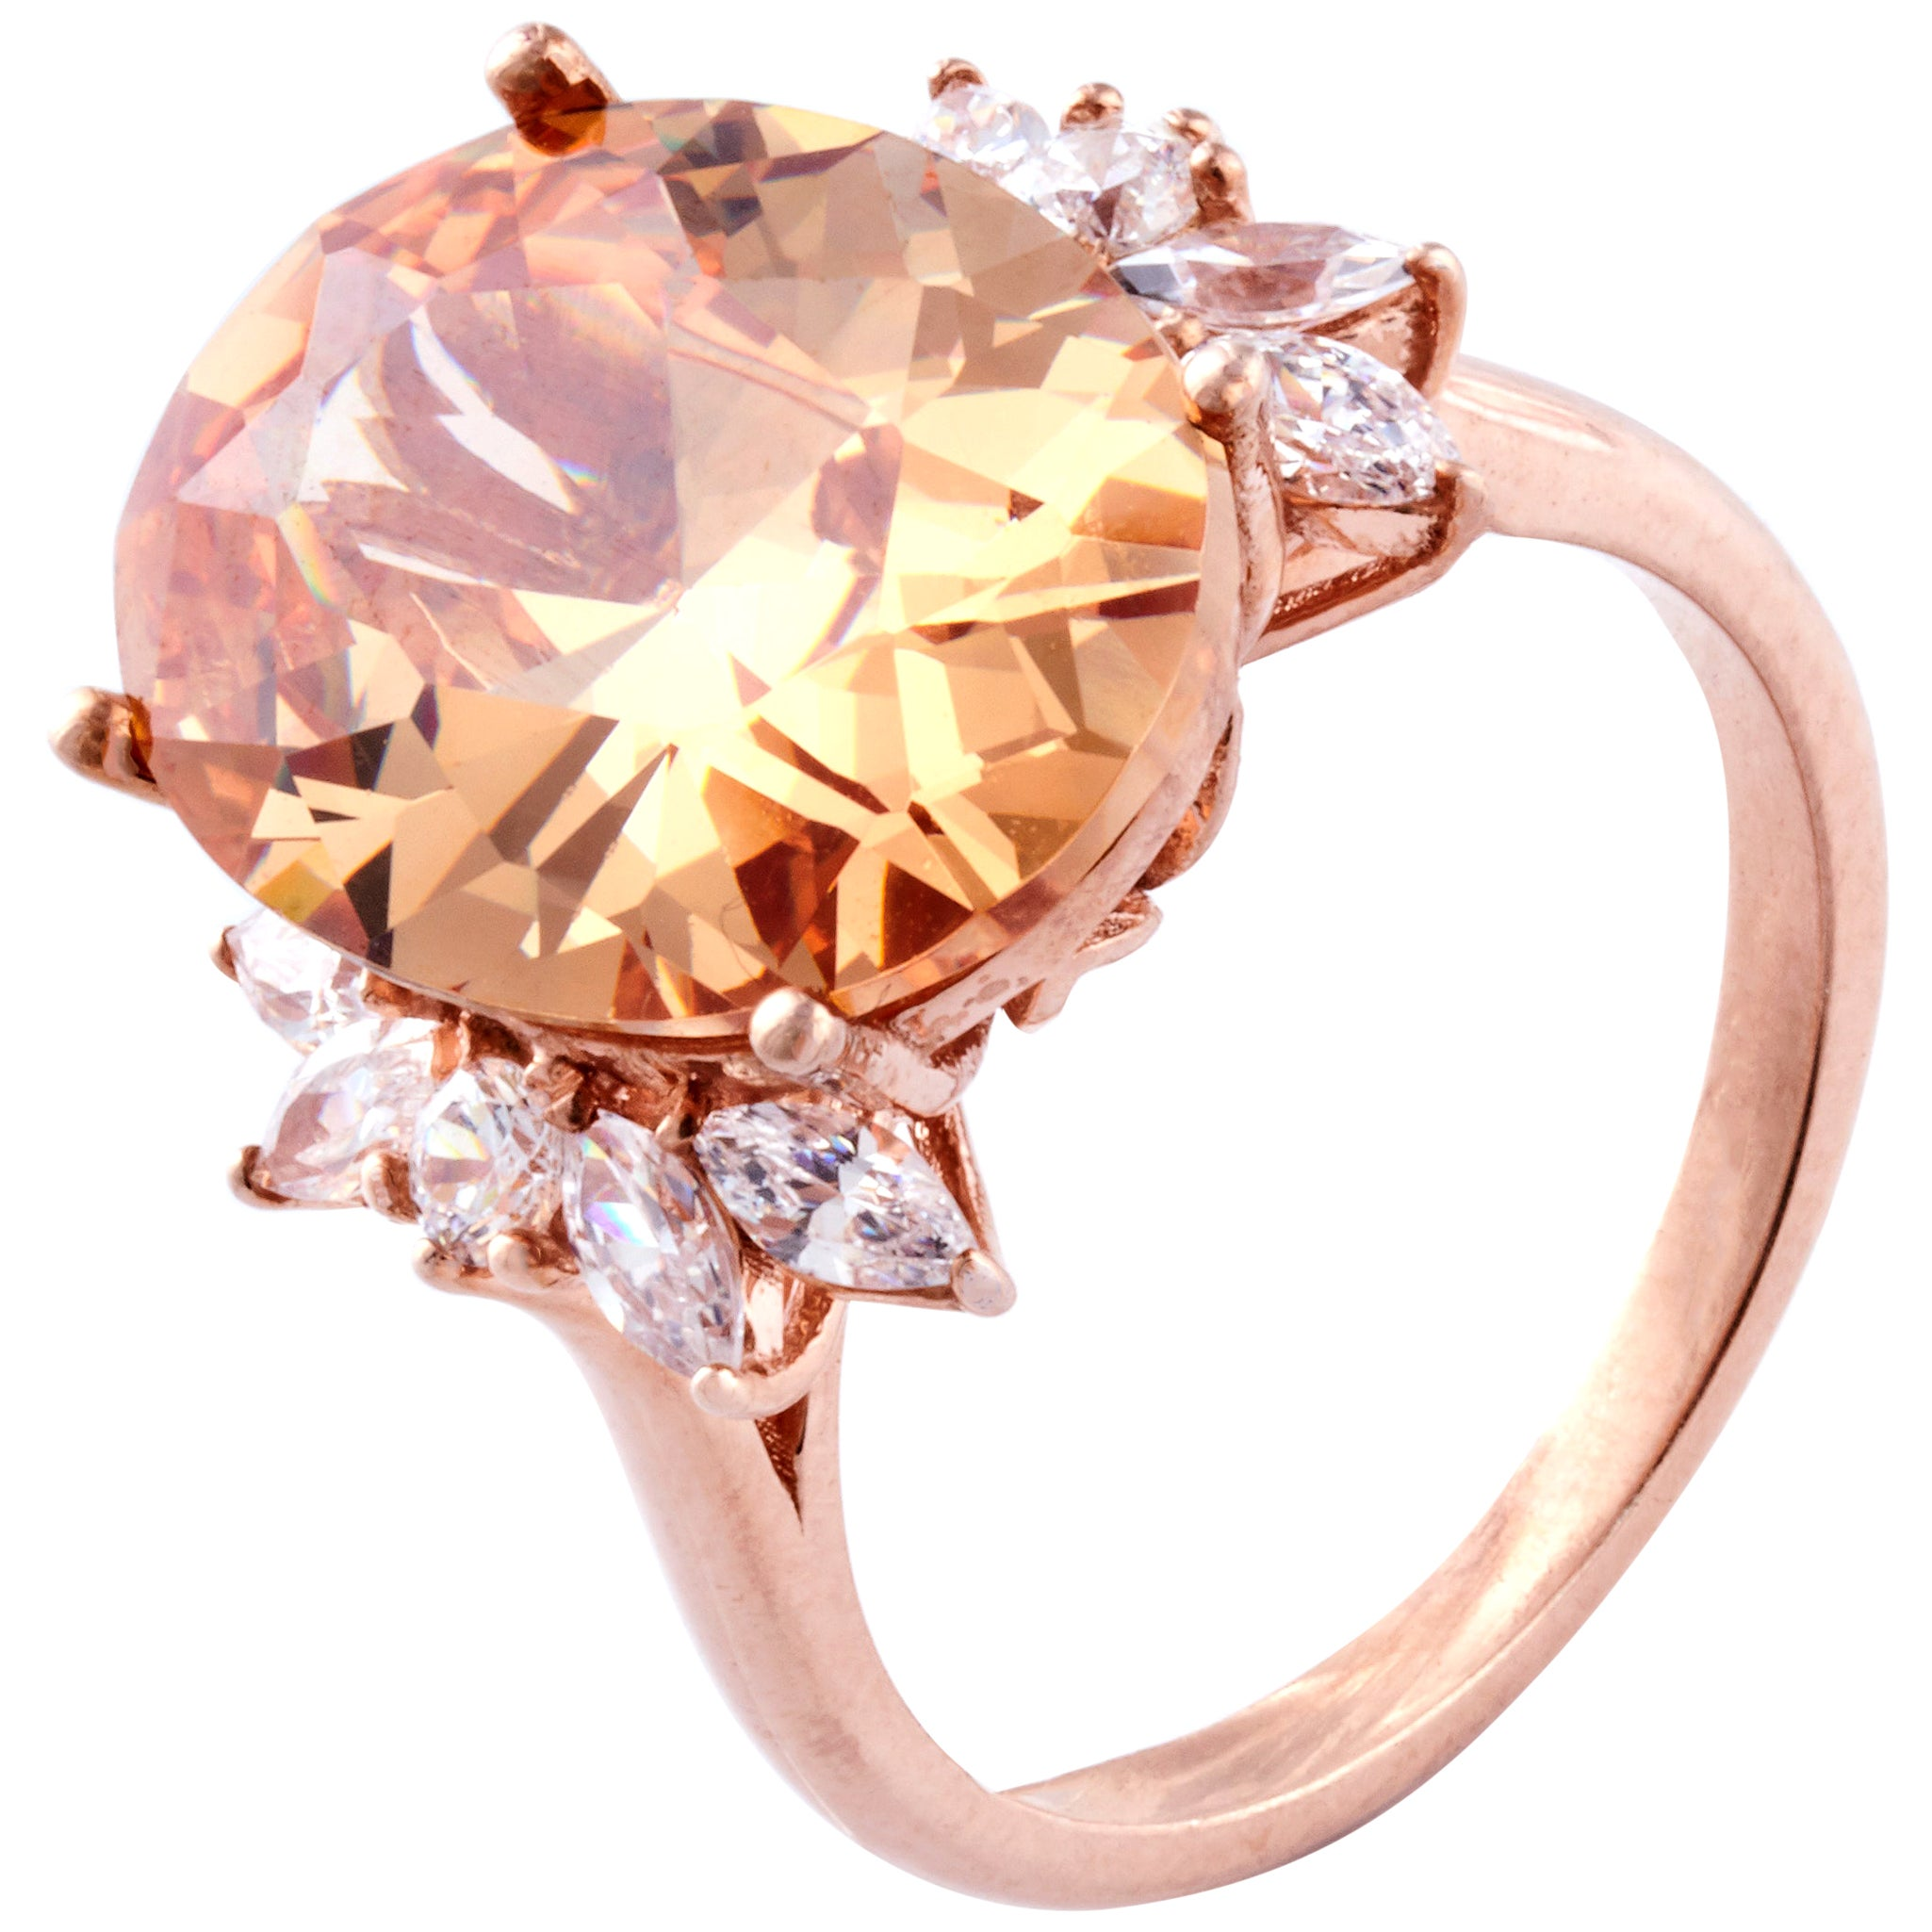 Morganite Diamond Fashion Ring Set in 18 Karat Rose Gold 'VS/G Diamonds'